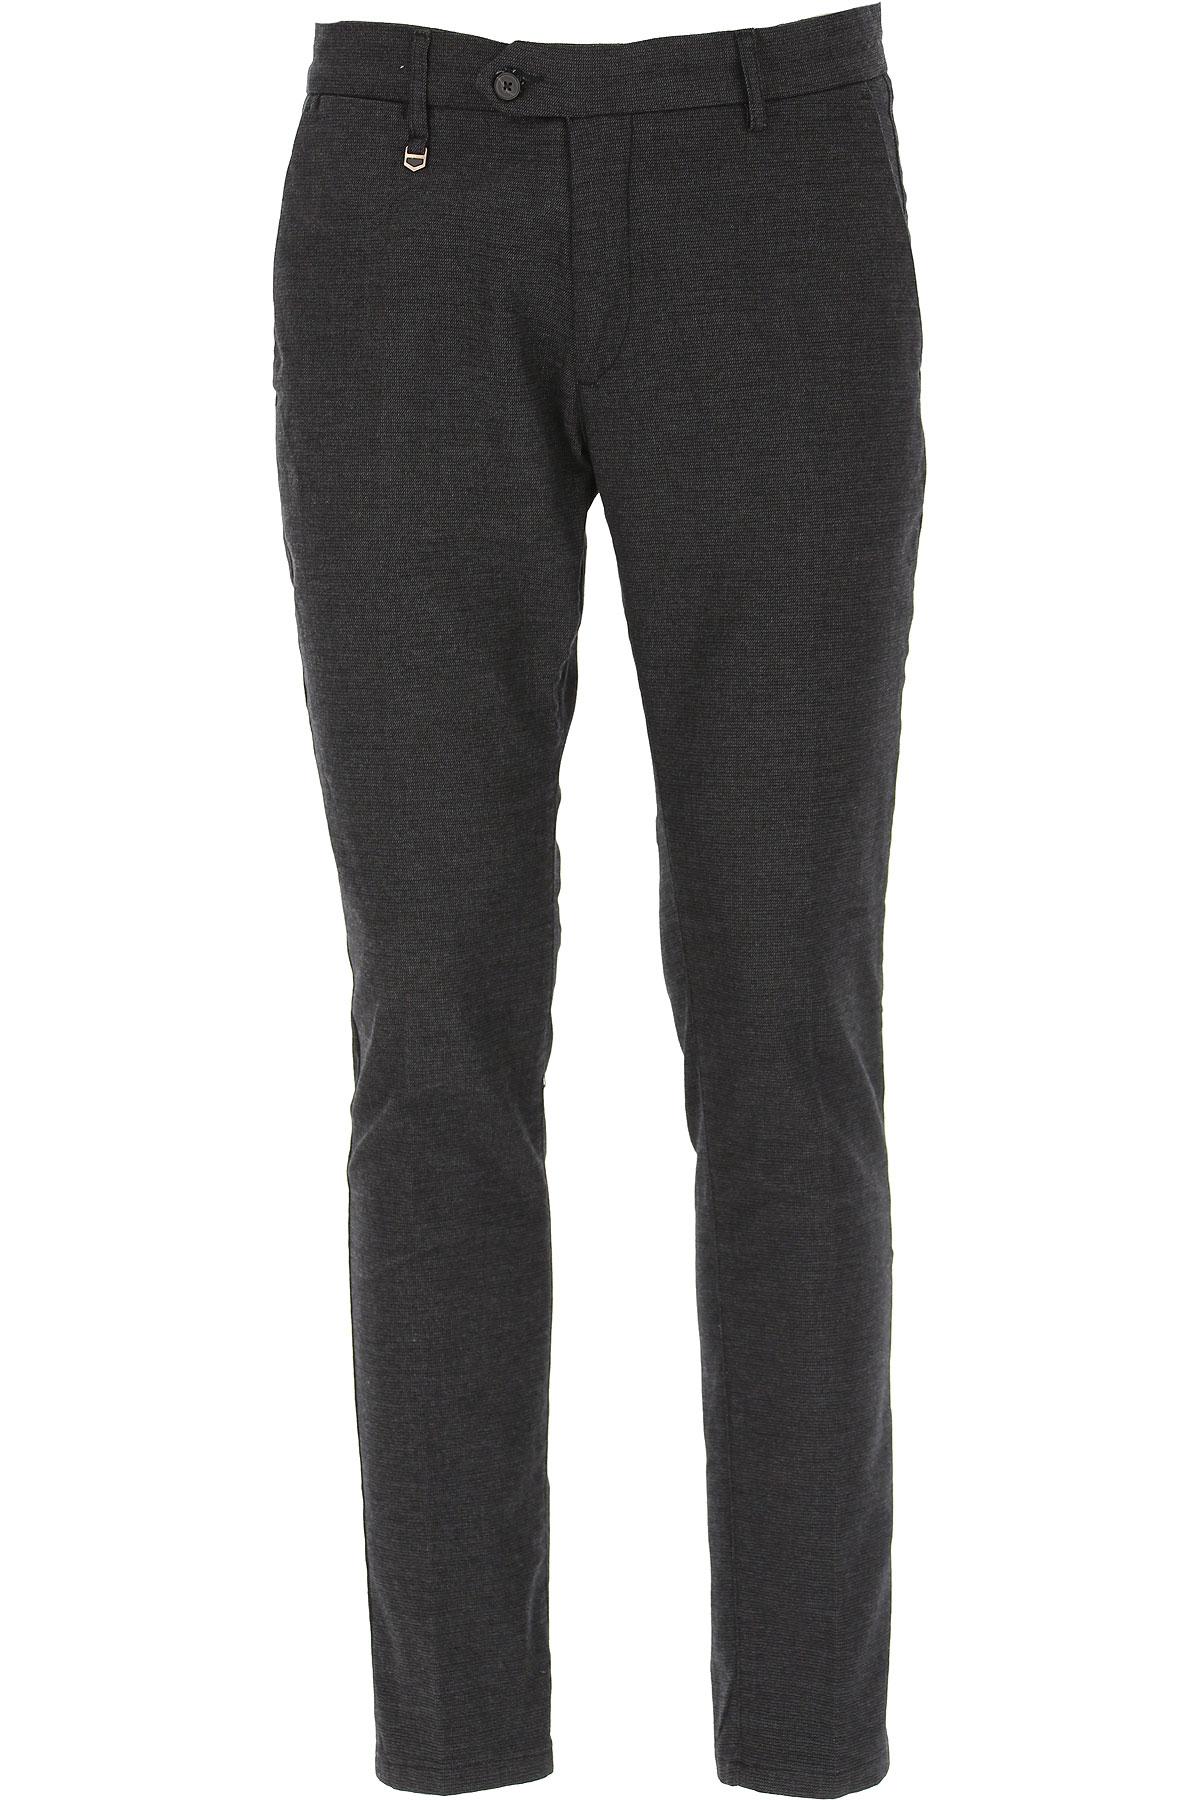 Antony Morato Pants for Men On Sale, Dark Anthracite Grey, Cotton, 2019, 31 32 33 34 36 38